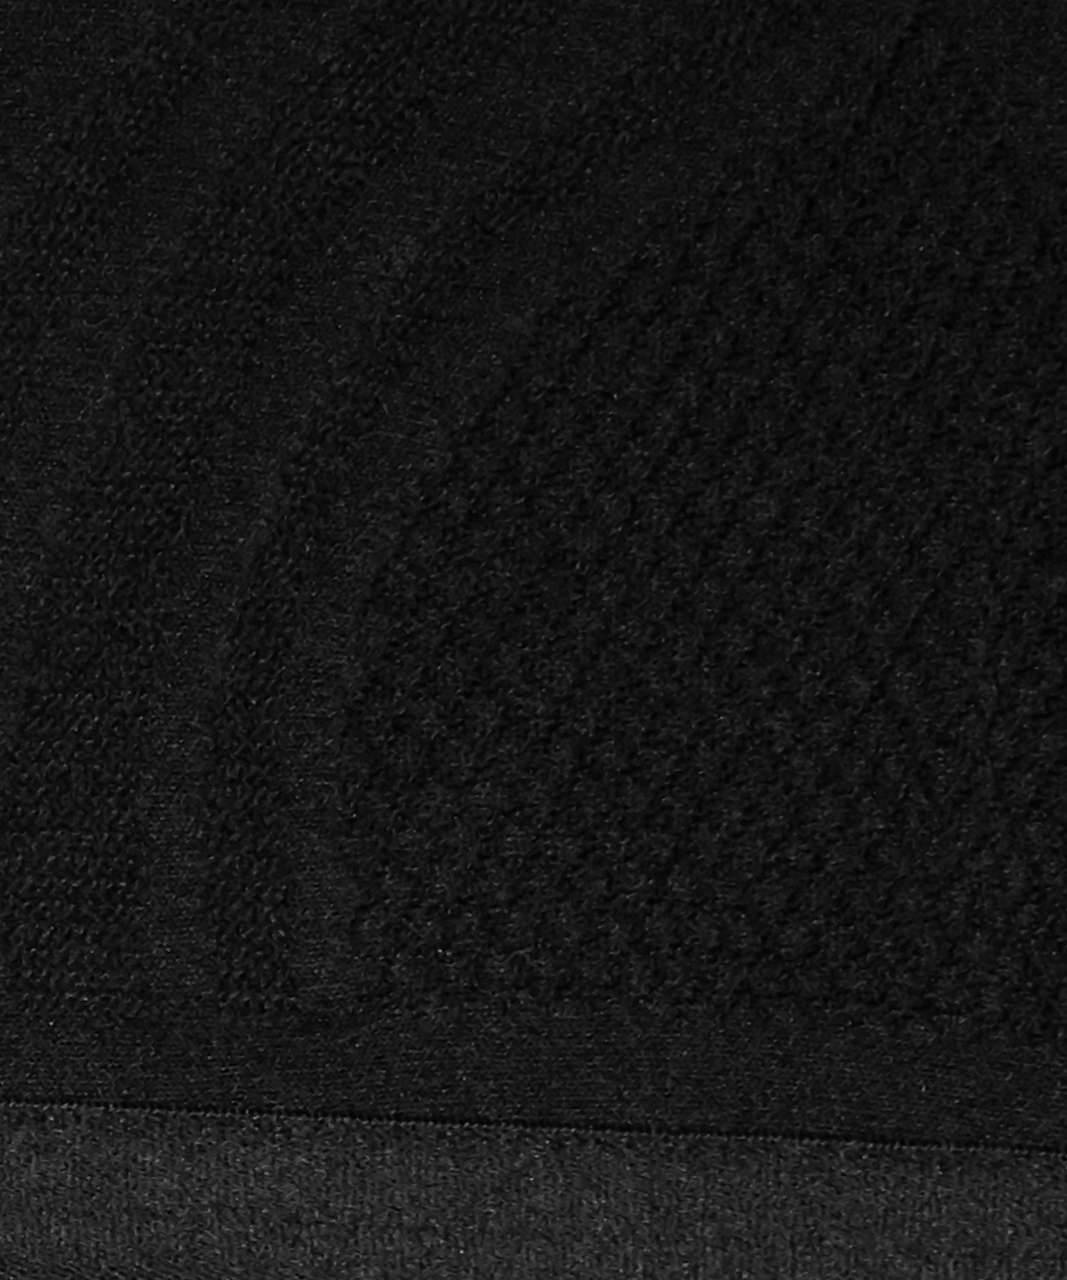 Lululemon Uncover Me Bralette - Black / Obsidian